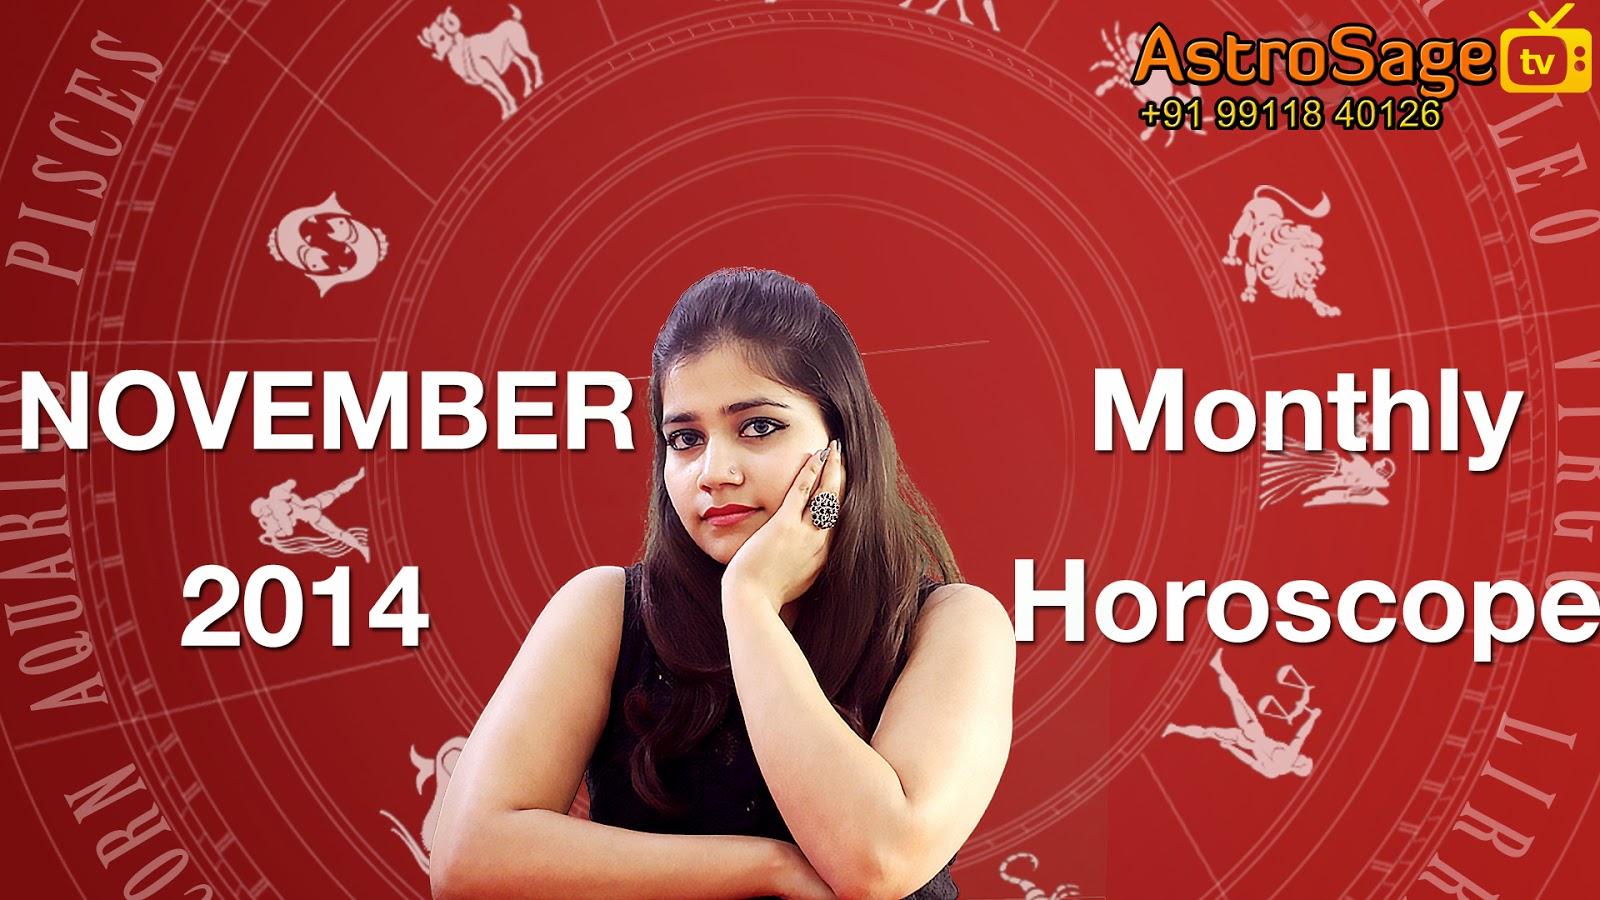 November 2014 Horoscope: November 2014 Astrology Predictions